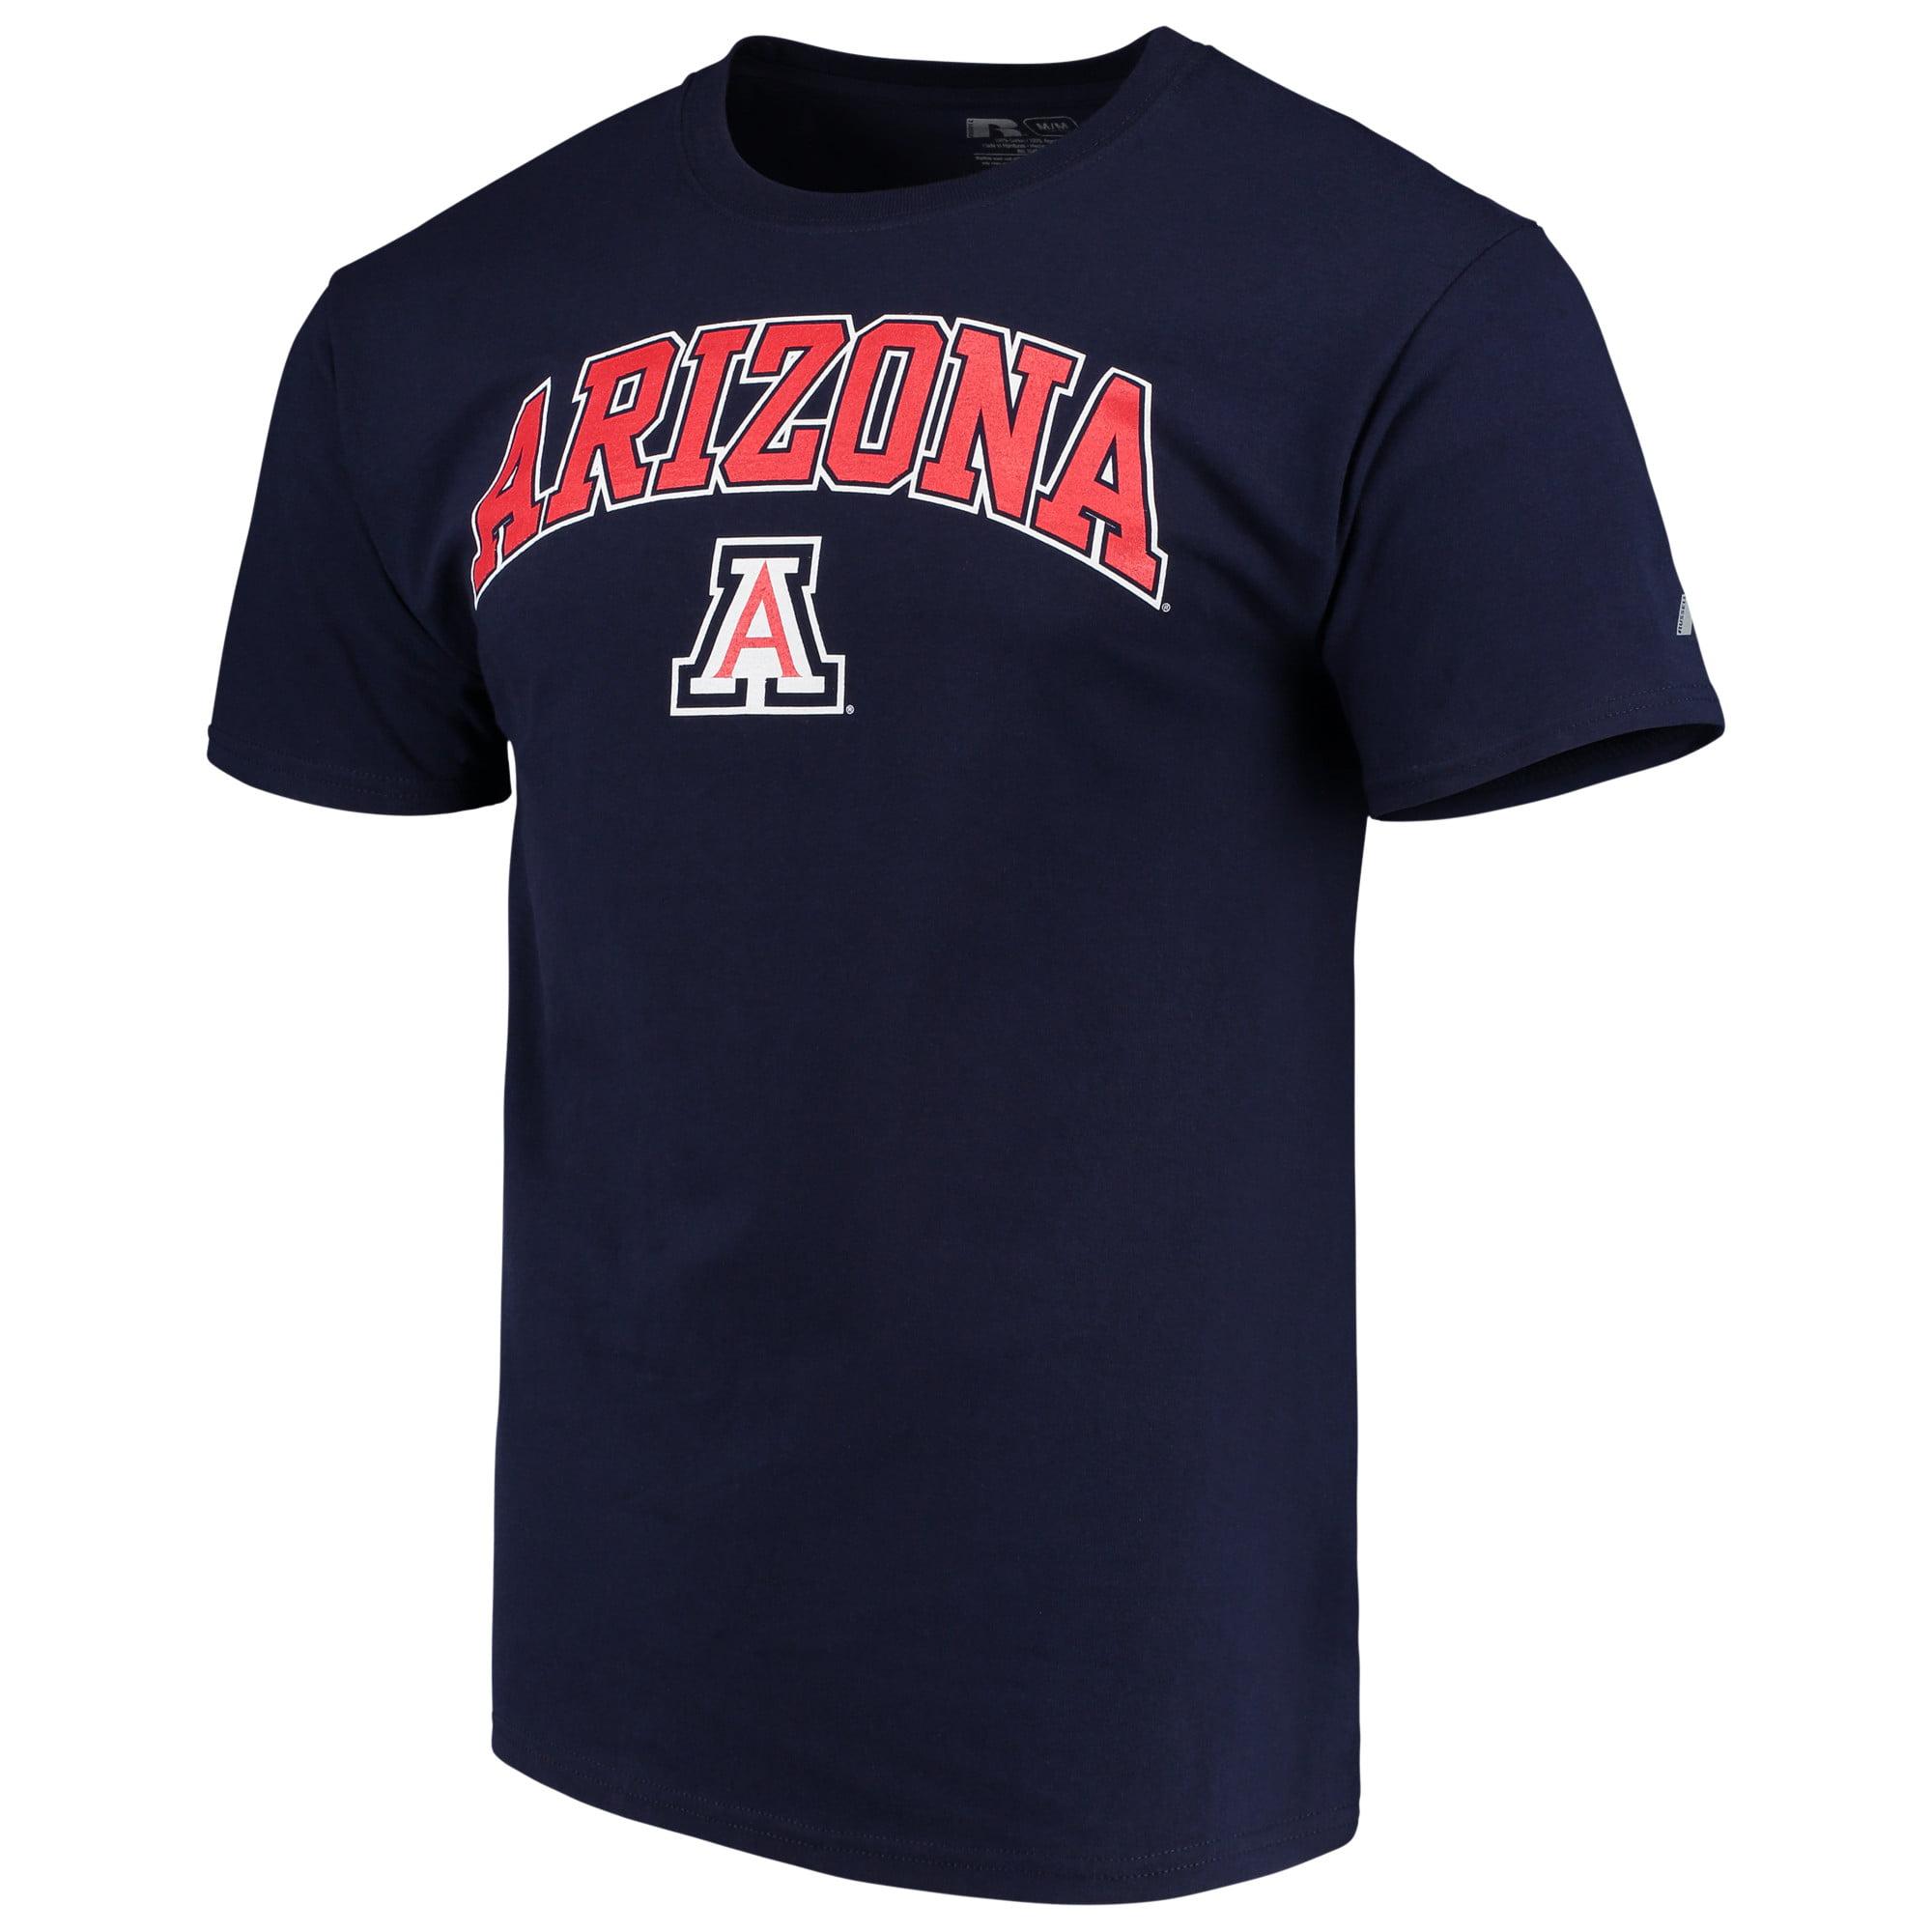 Men's Russell Navy Arizona Wildcats Crew Core Print T-Shirt